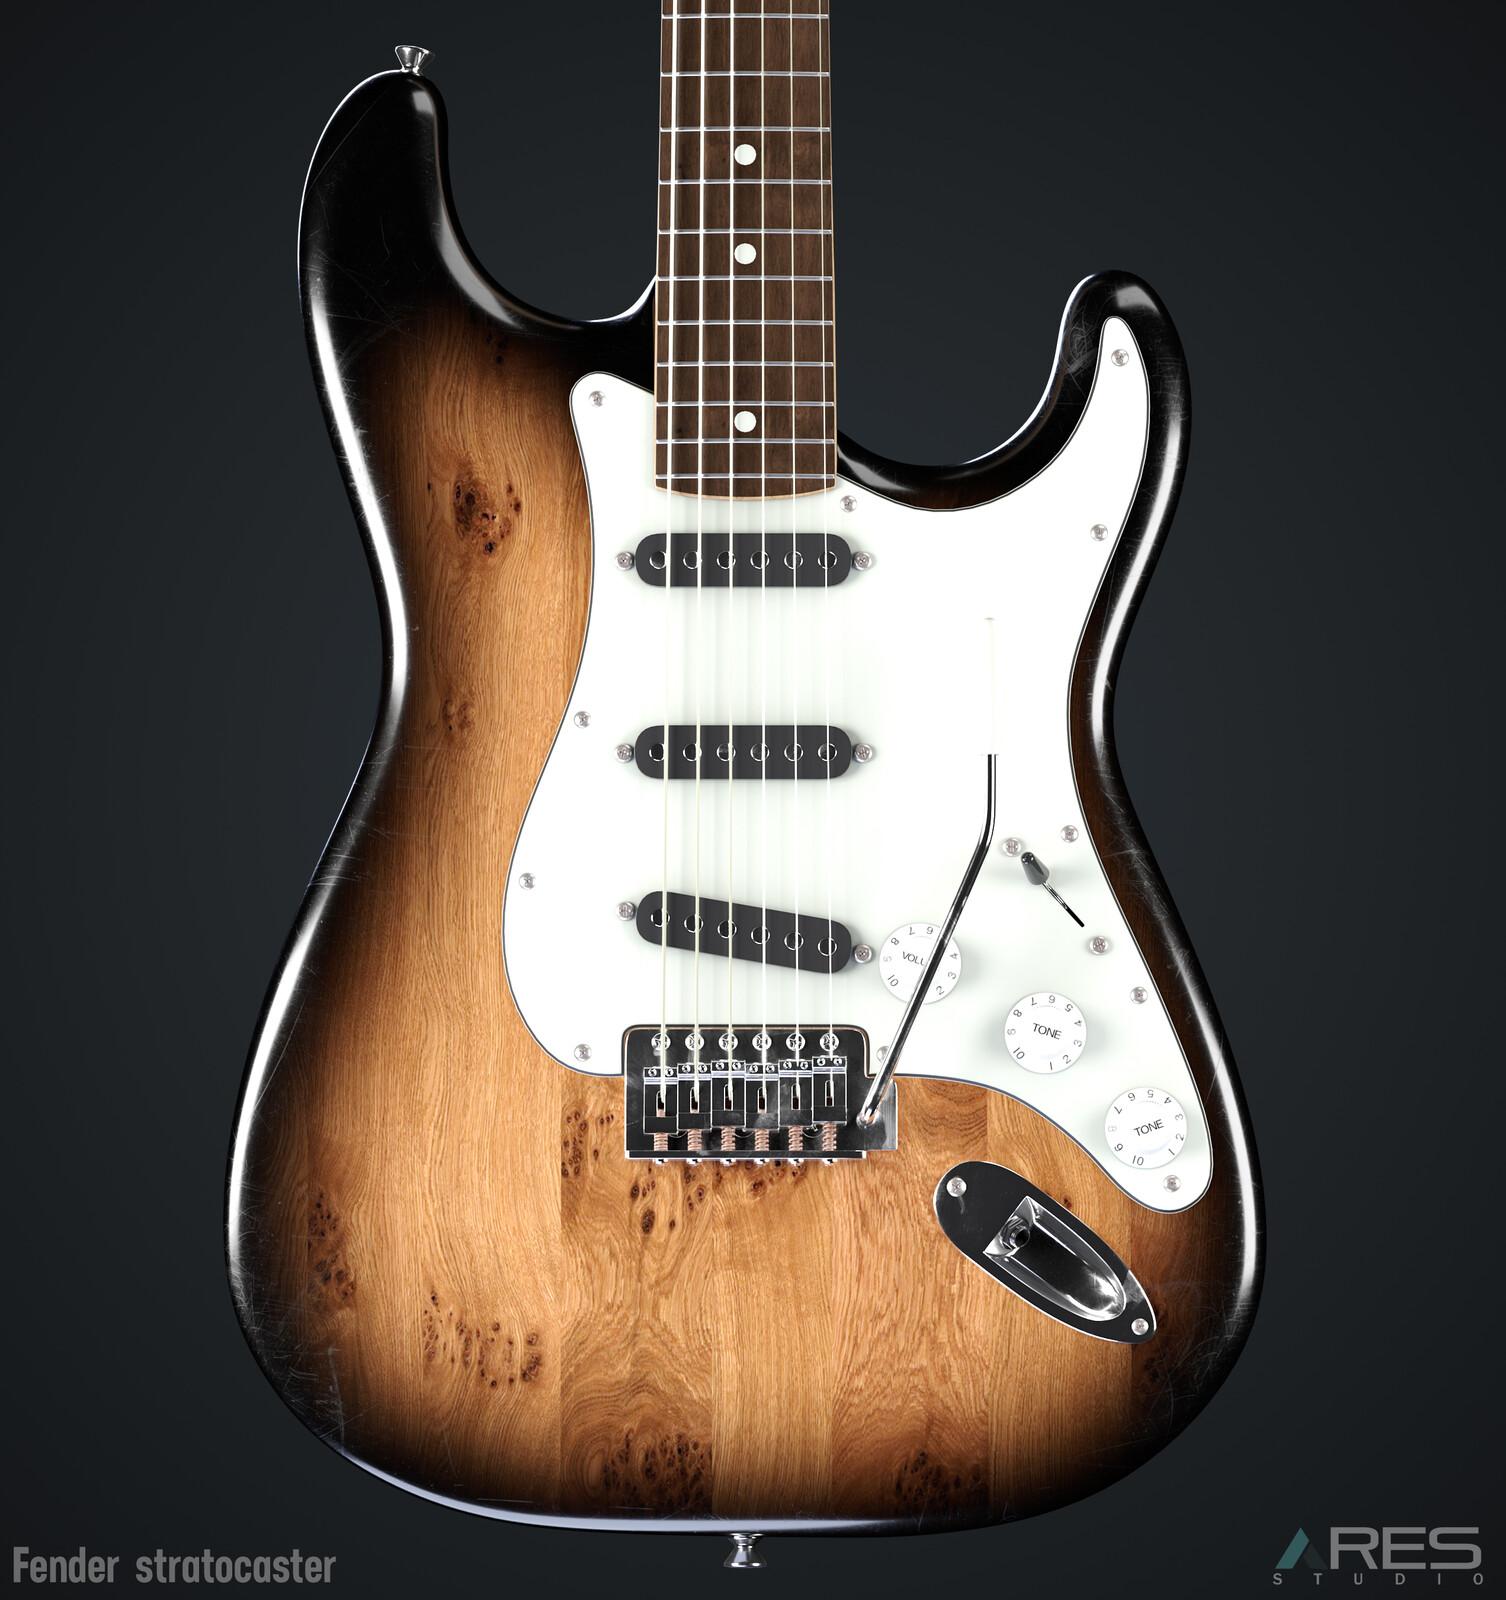 Fender - Stratocaster (PhotoRealistic)